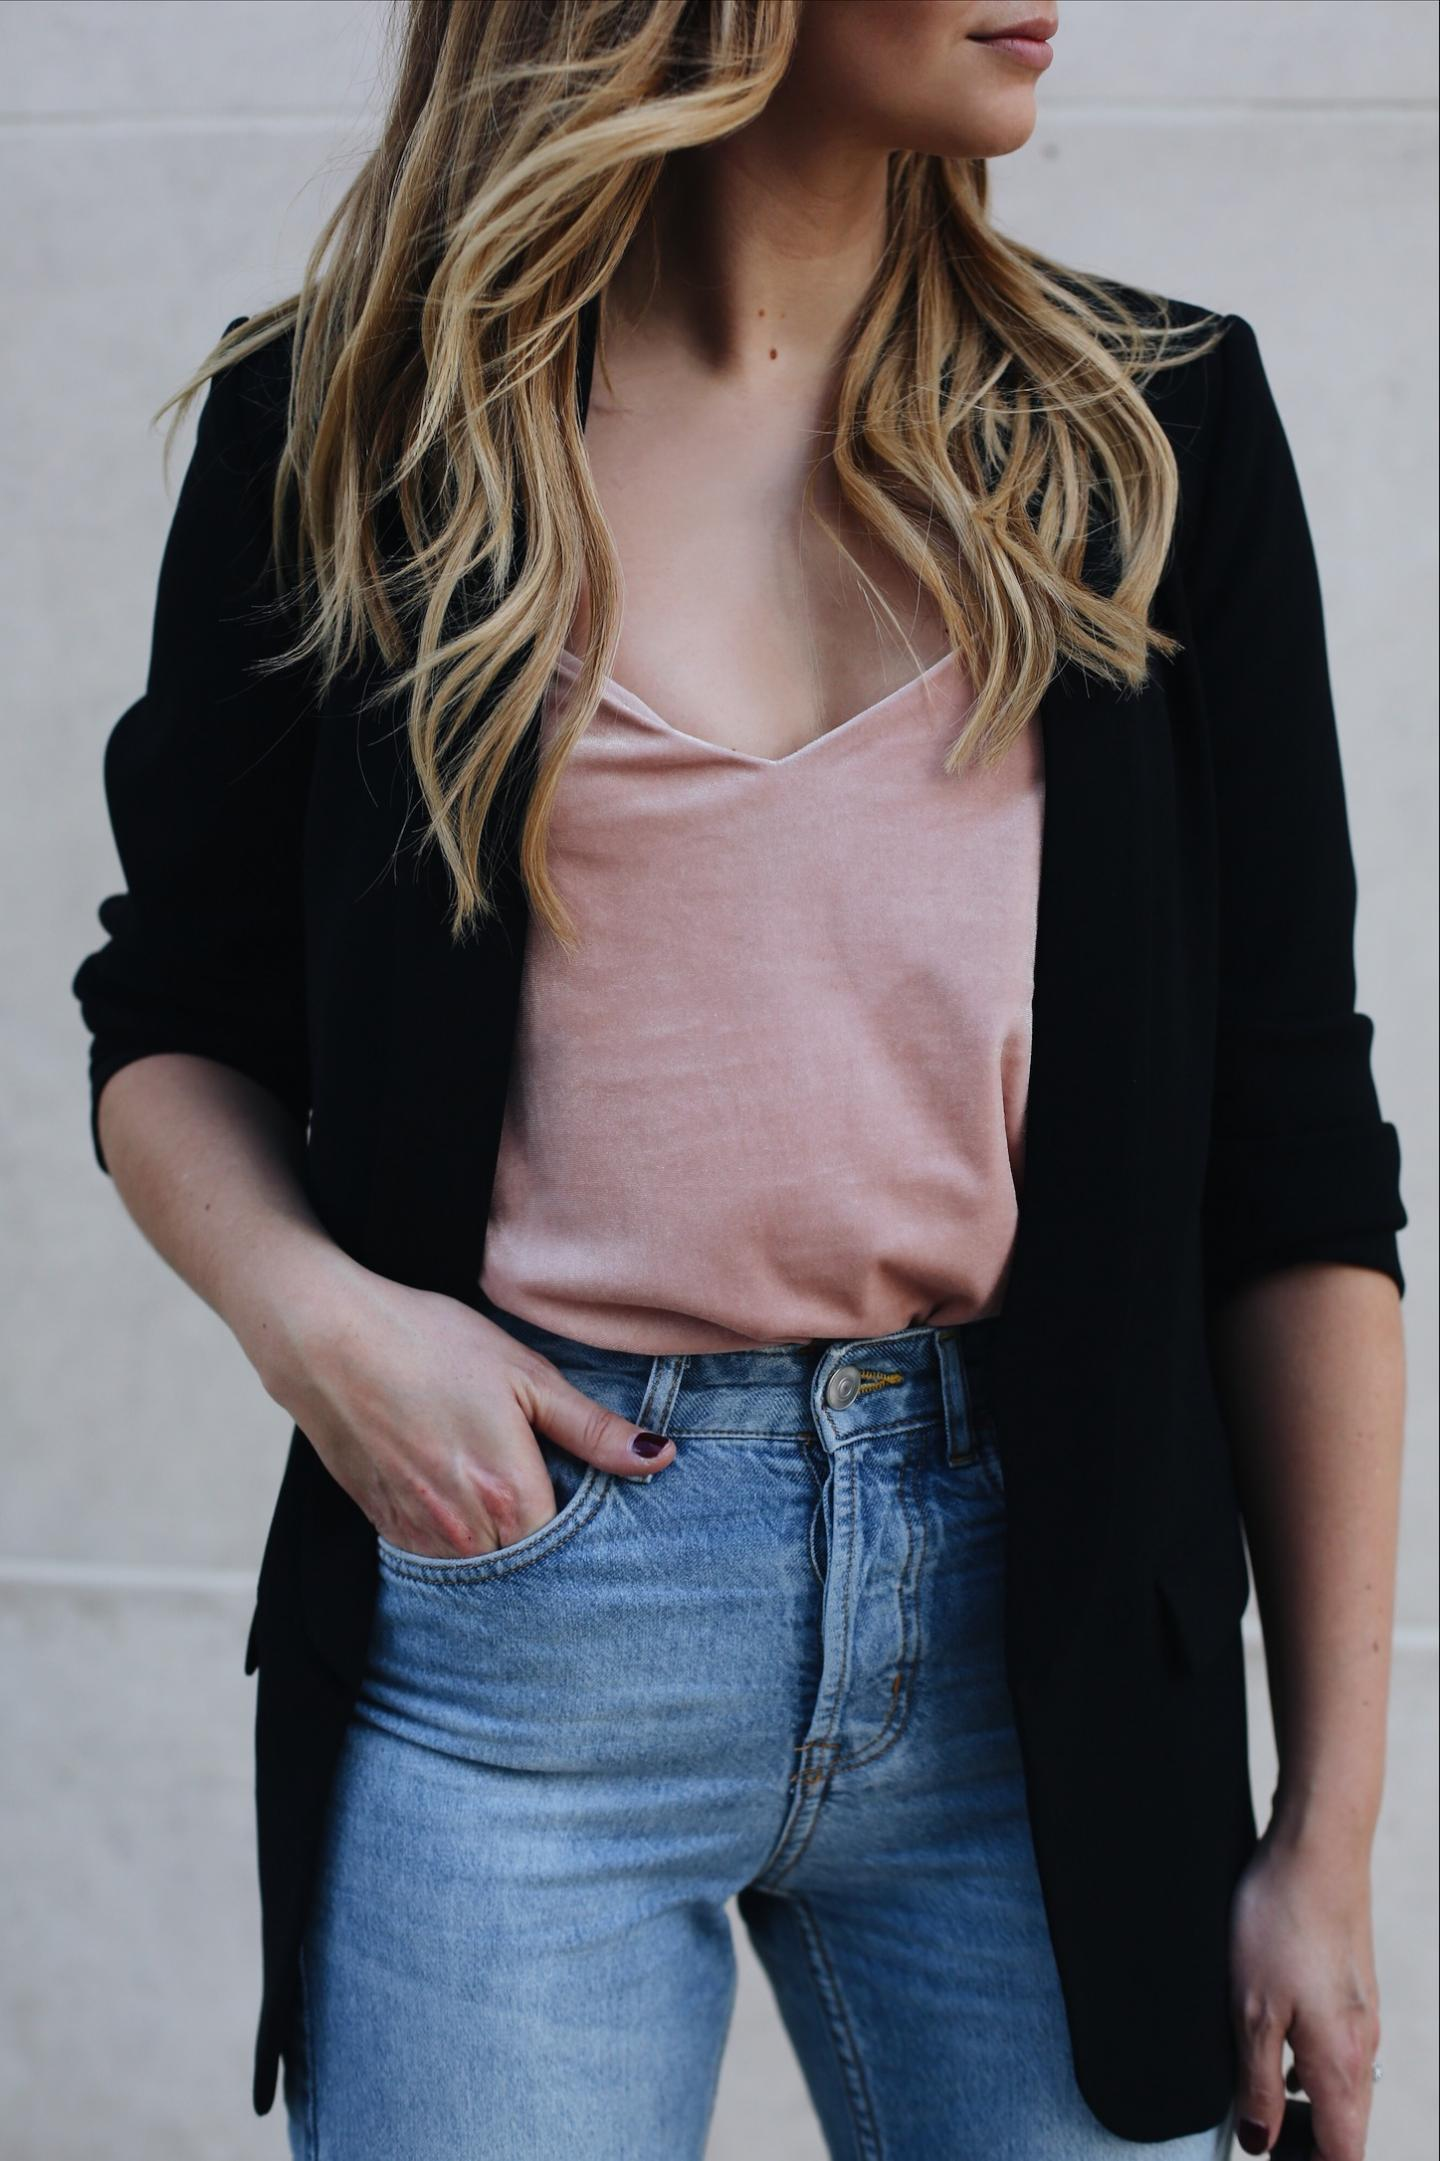 Emma Hill wears pink velvet came top, black blazer, ripped hem frayed jeans